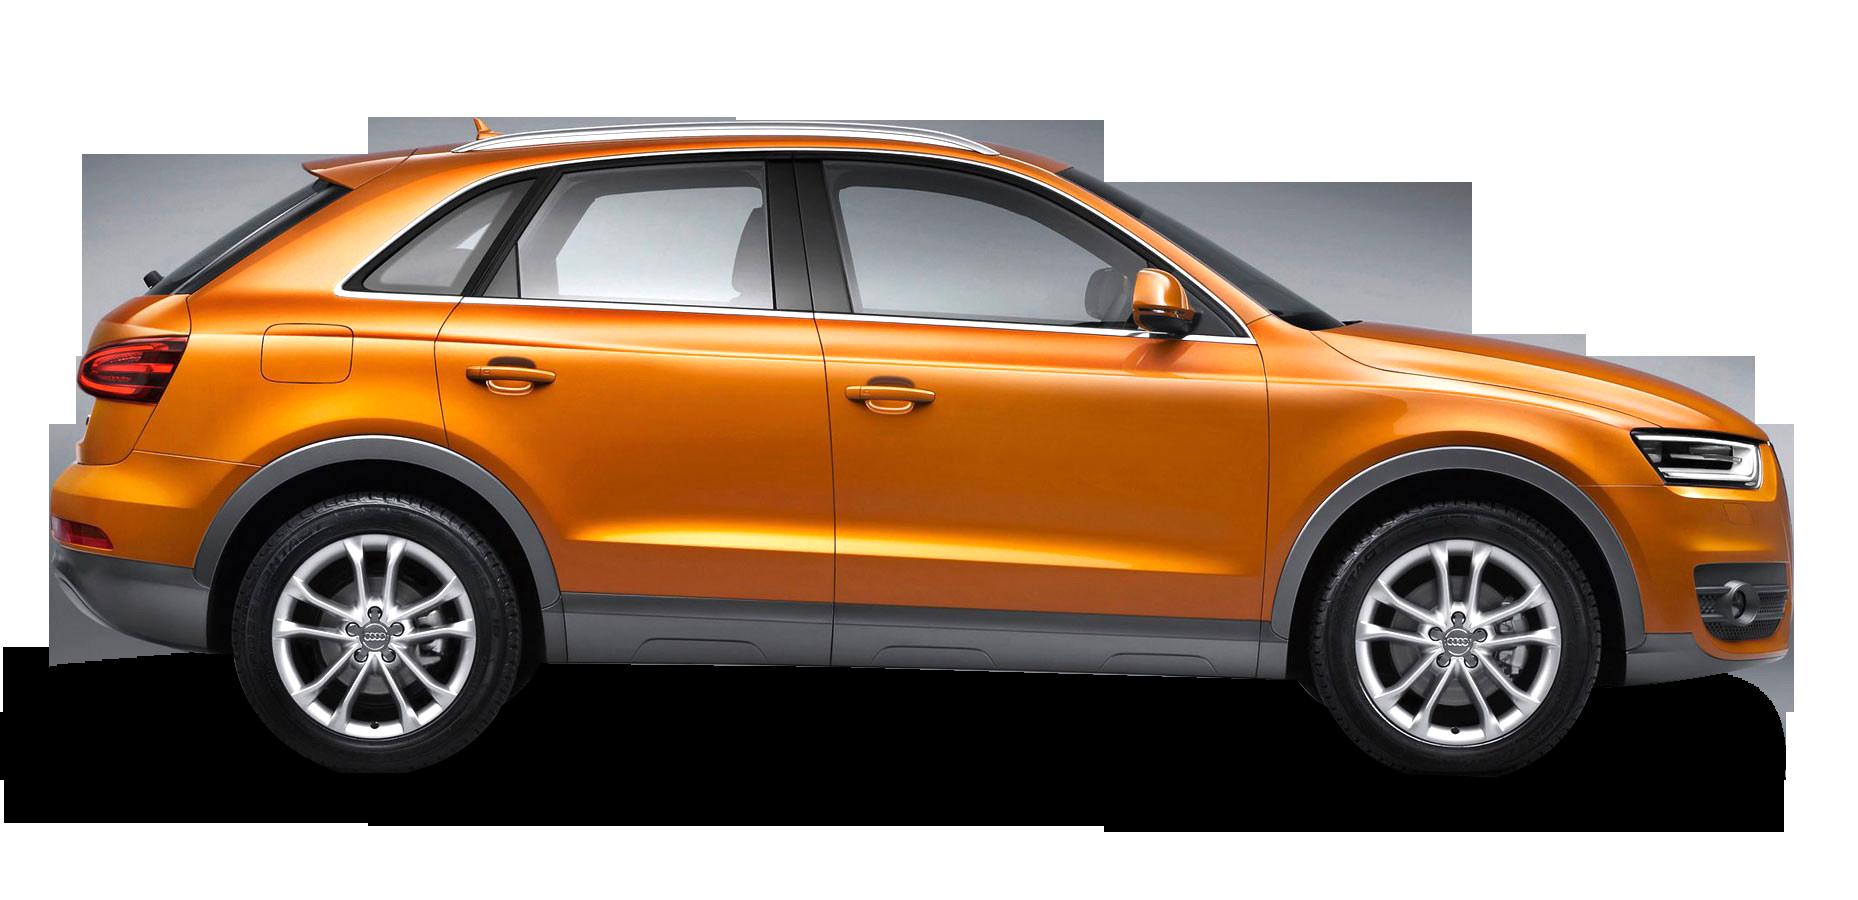 Free Car Png Transparent Images Download Free Clip Art Free Clip Car Audi Q3 Family Car Trip